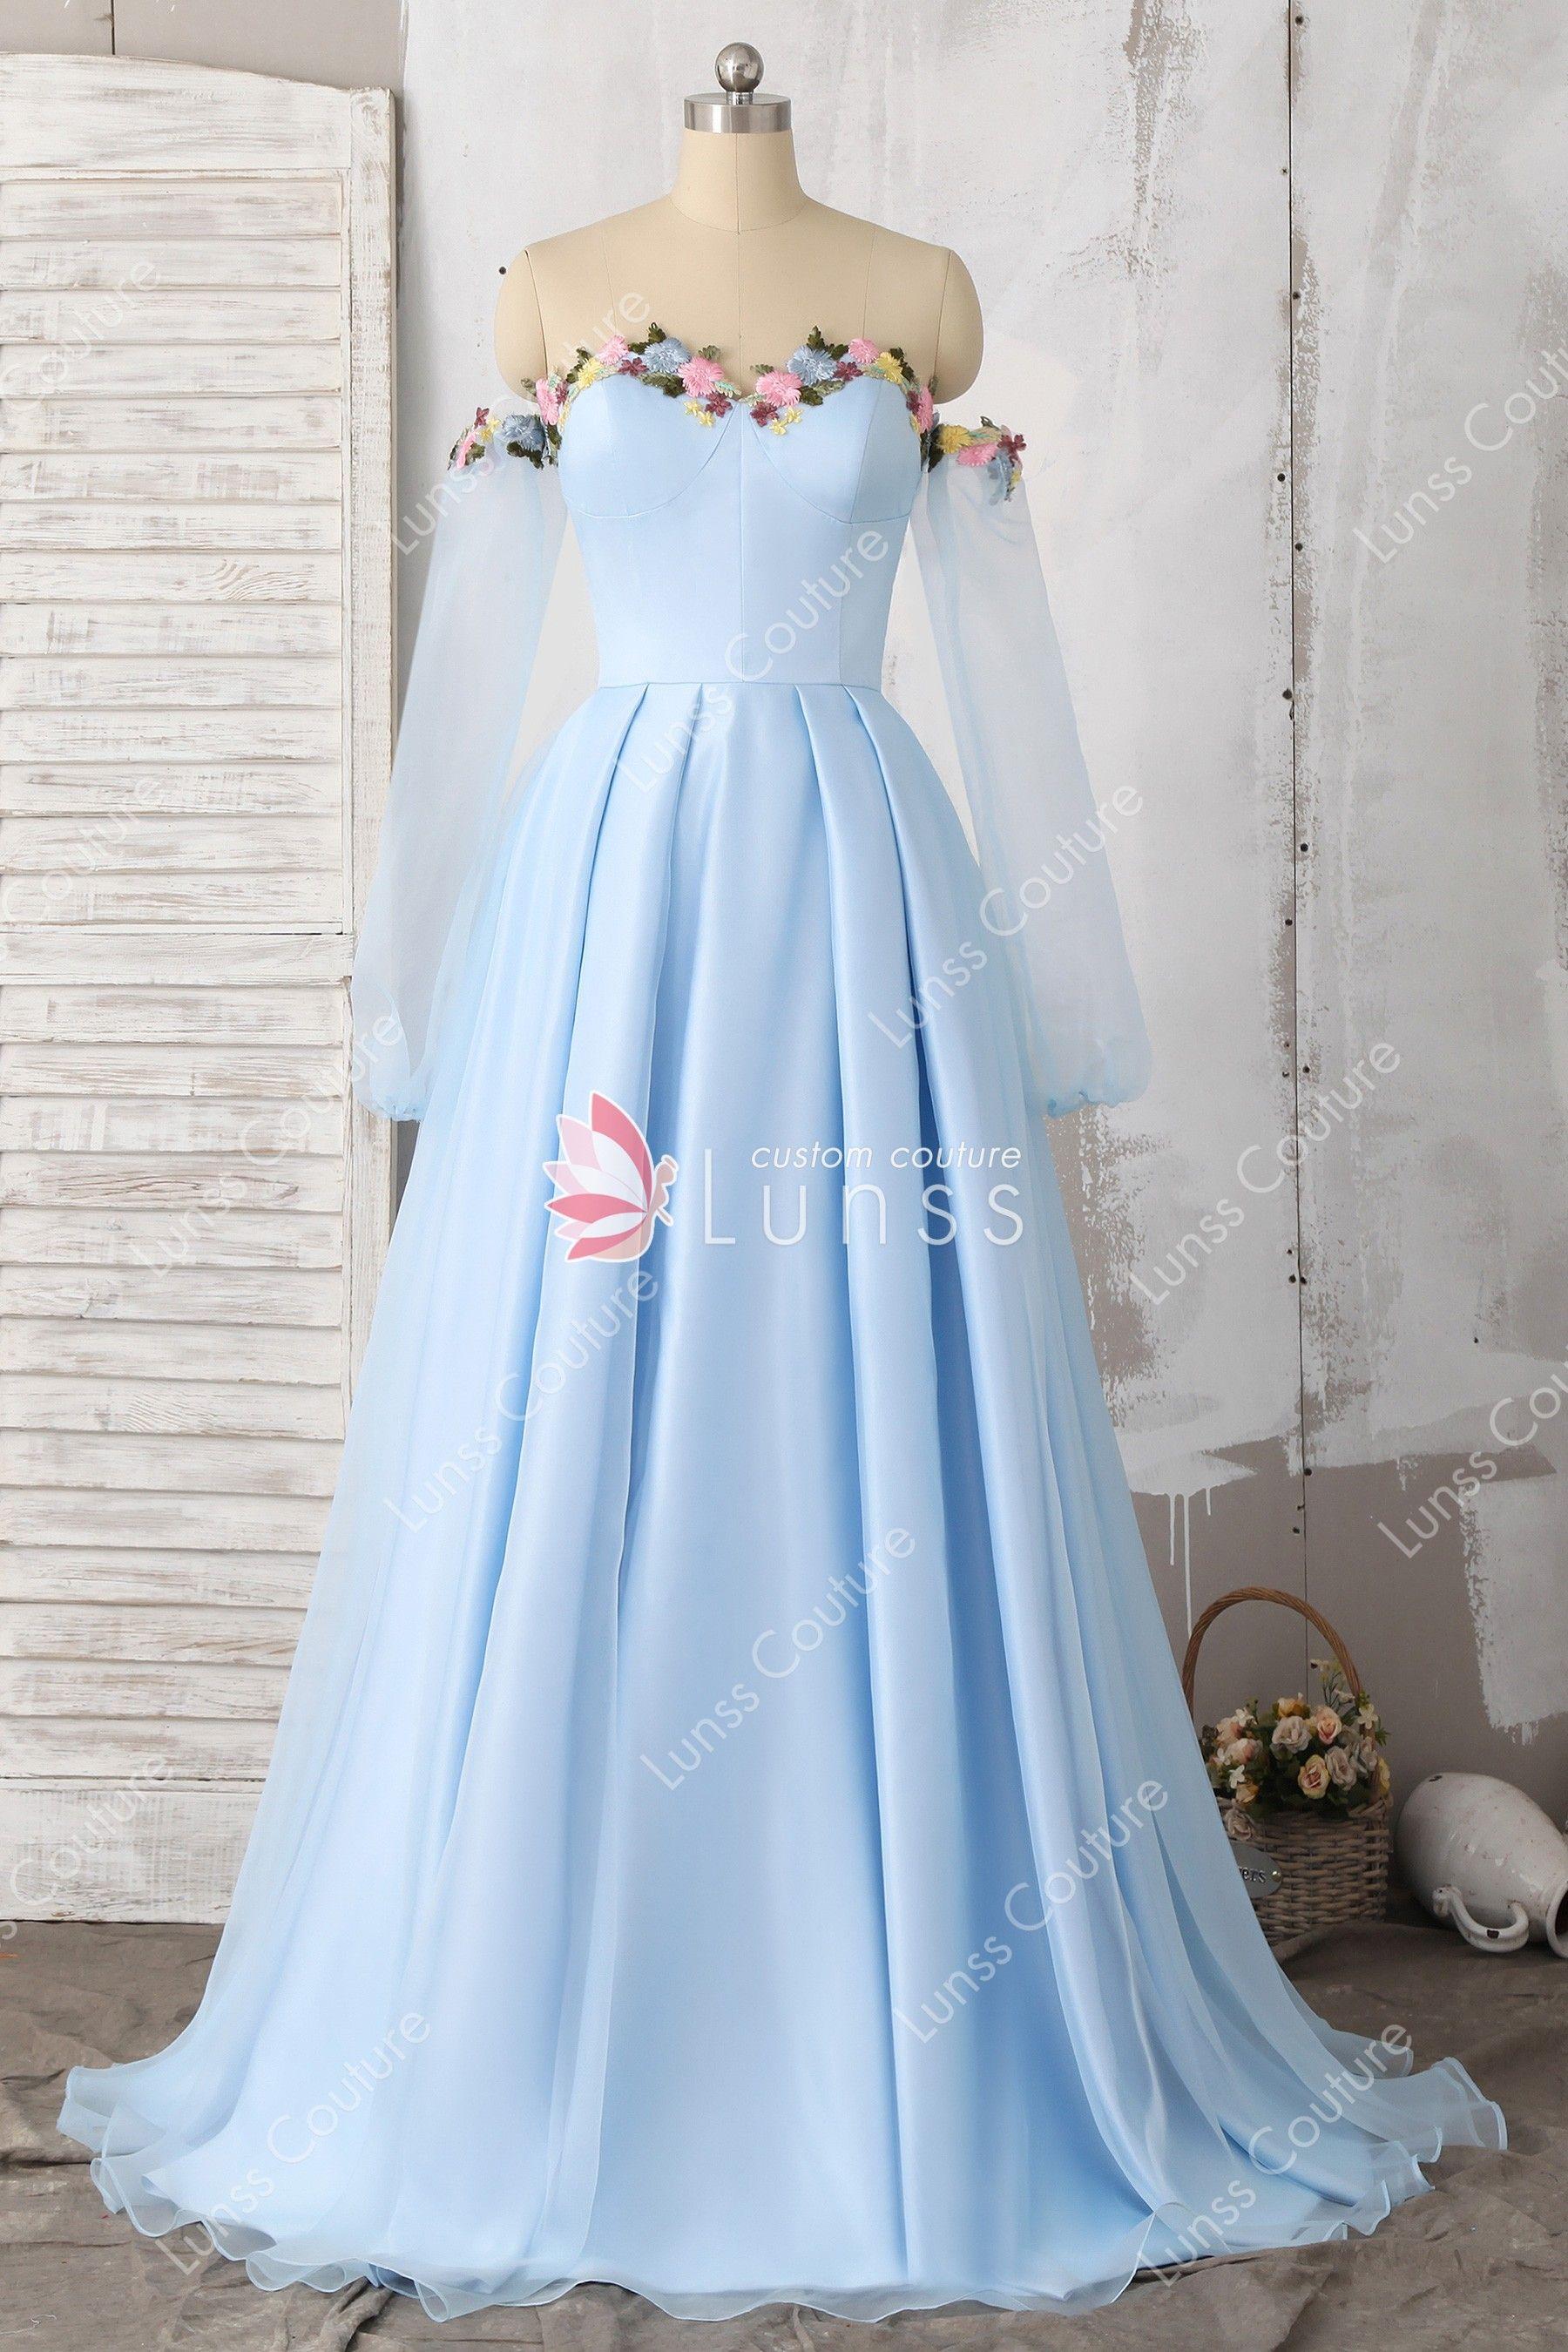 Off Shoulder Sky Blue Sweetheart A Line Prom Dress Sweetheart Neckline Prom Dresses Diy Prom Dress Floral Prom Dresses [ 2700 x 1800 Pixel ]